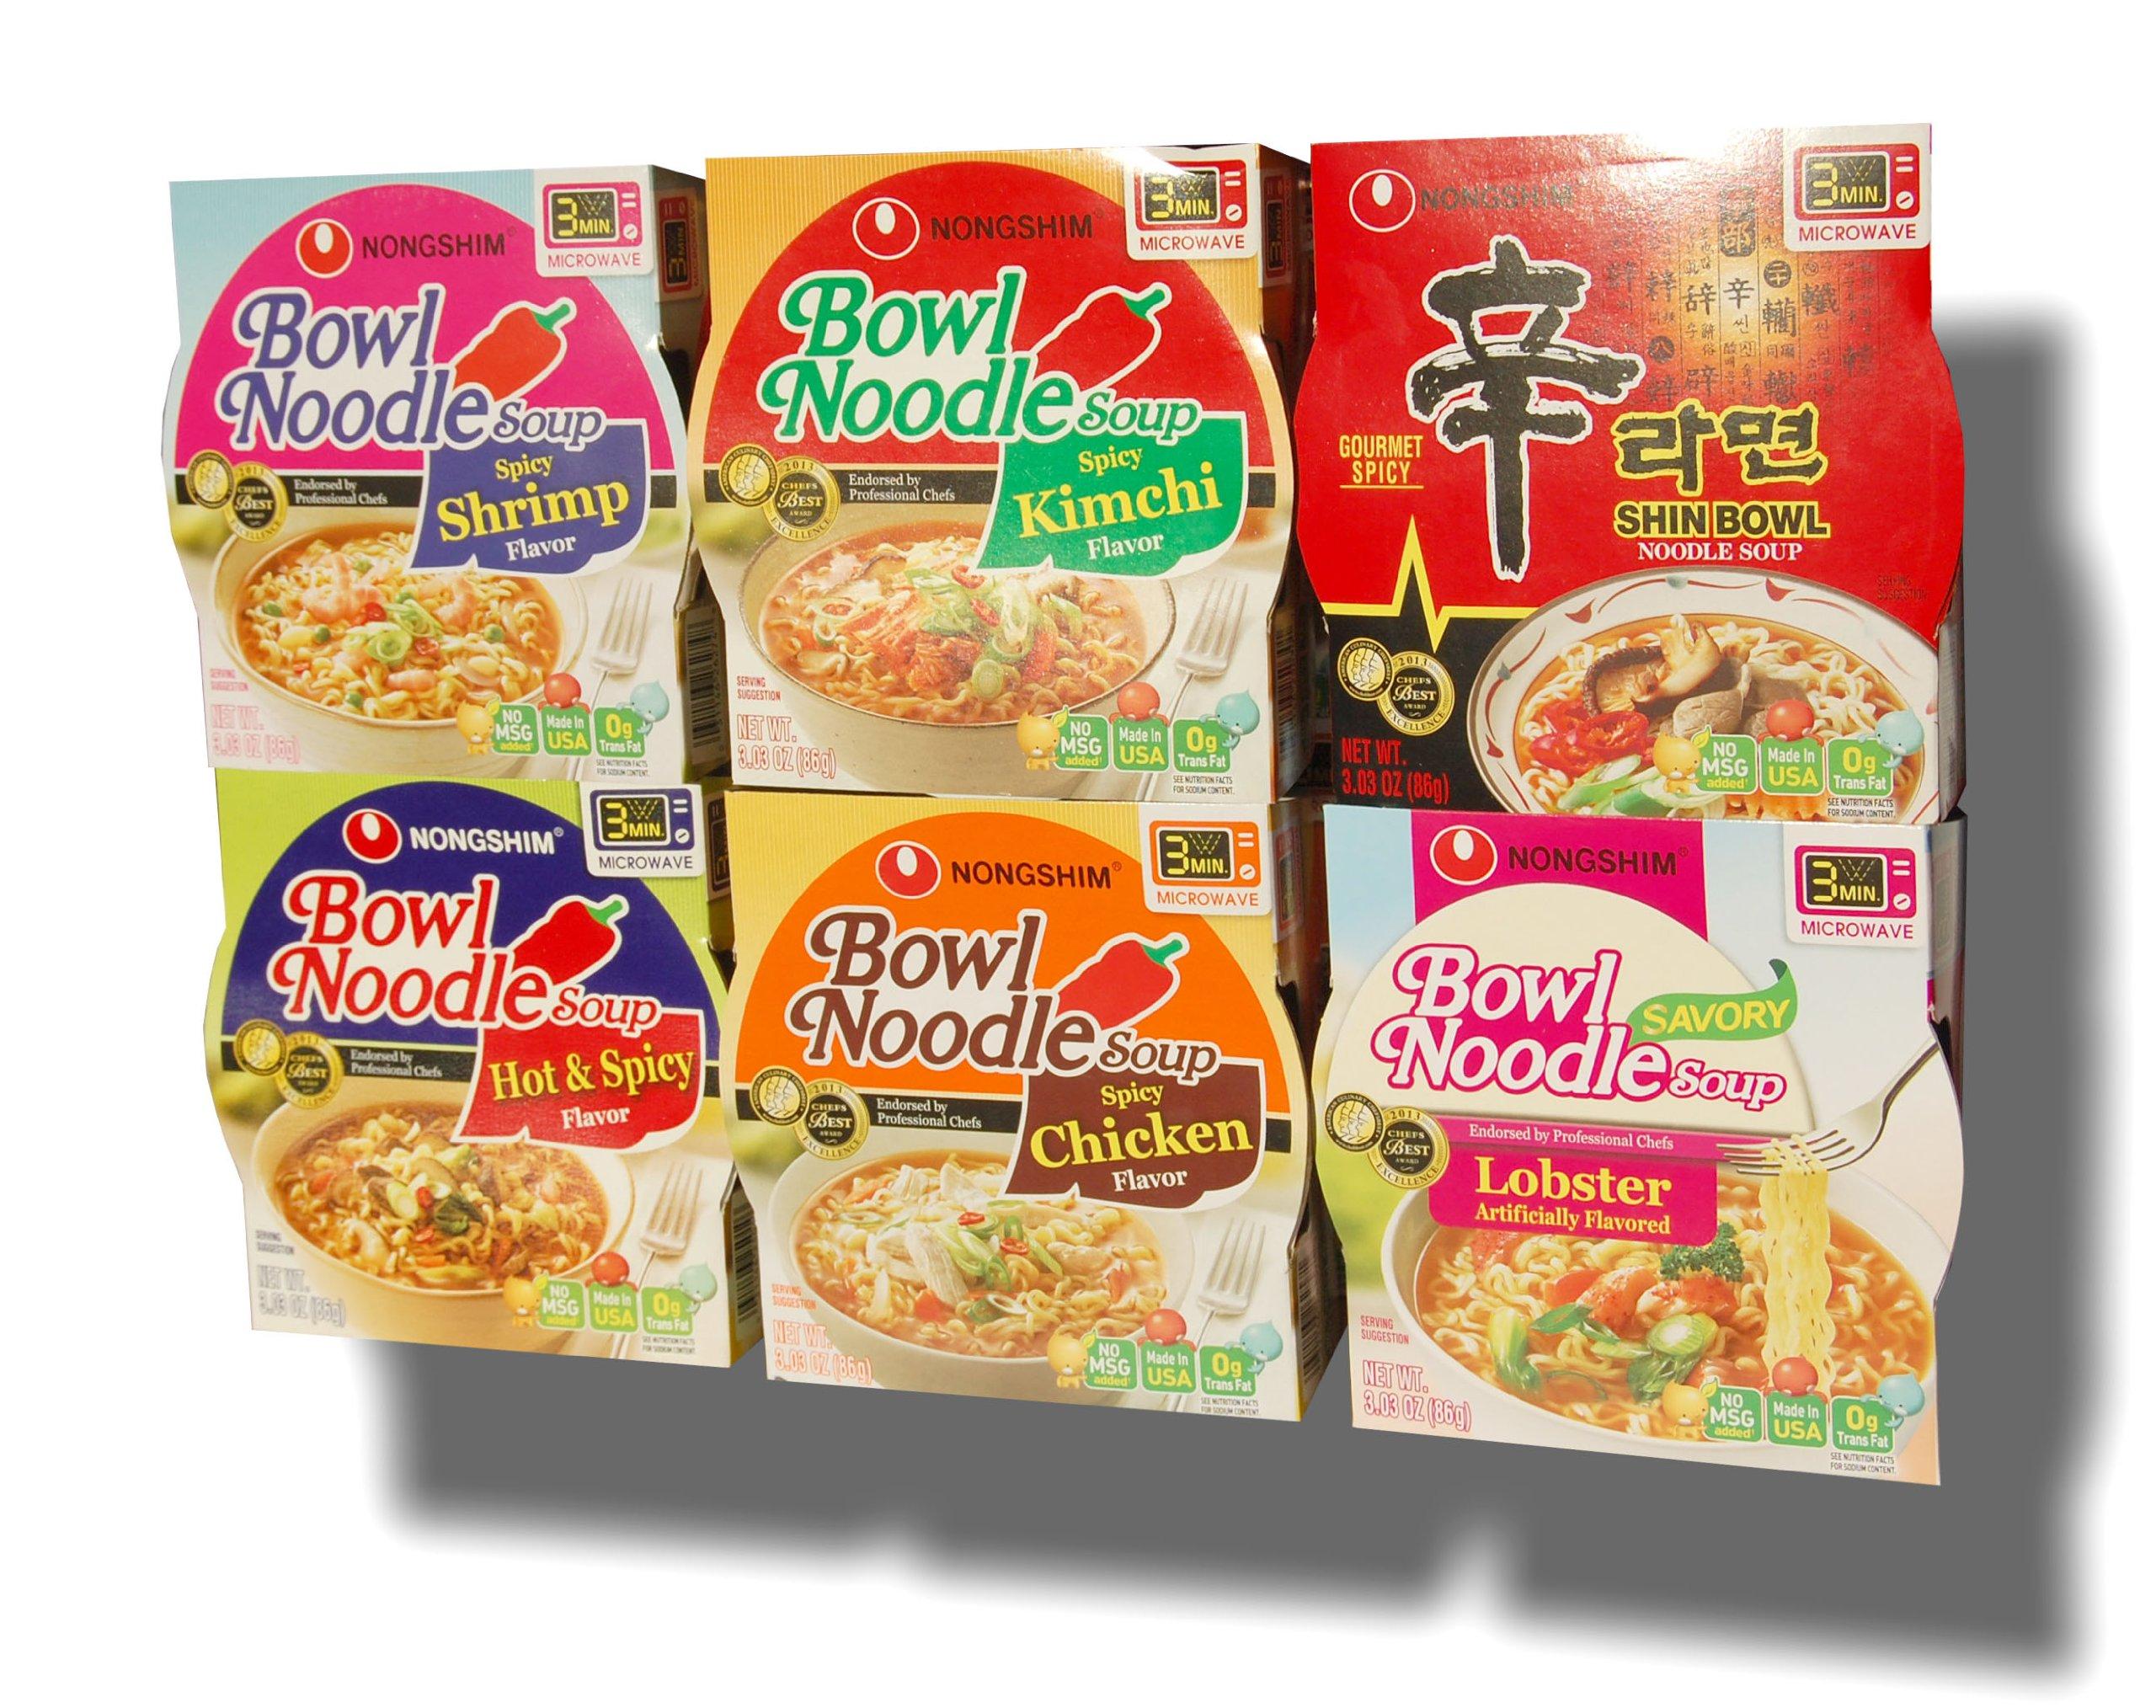 Amazon.com : NongShim Bowl Noodle Soup, Hot and Spicy, 3